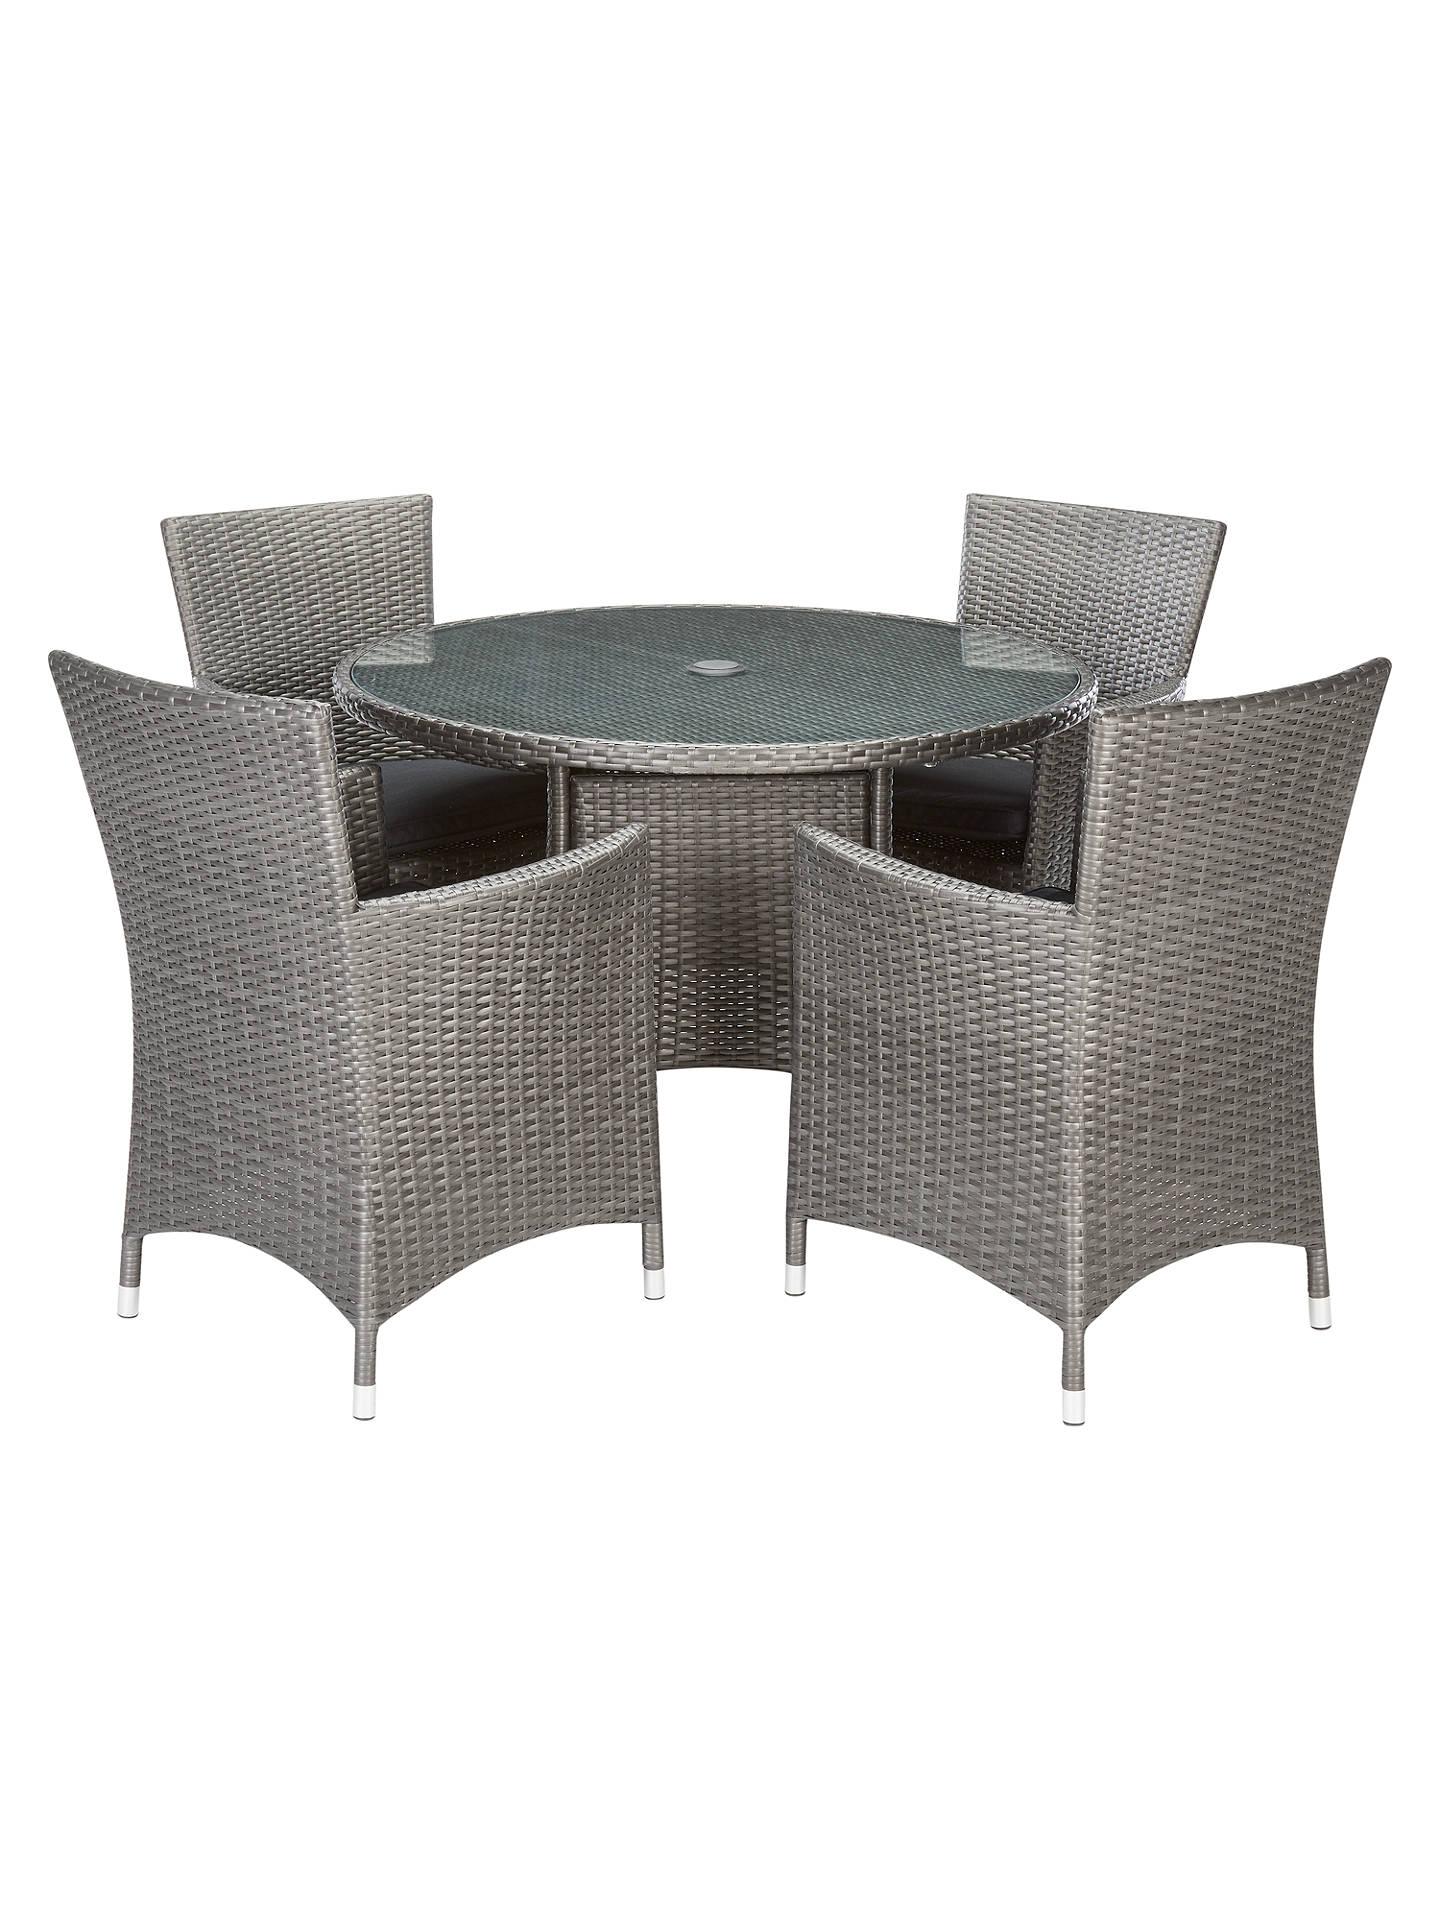 BuyJohn Lewis U0026 Partners Almeria Garden 4 Seater Dining Table, Grey Online  At Johnlewis.